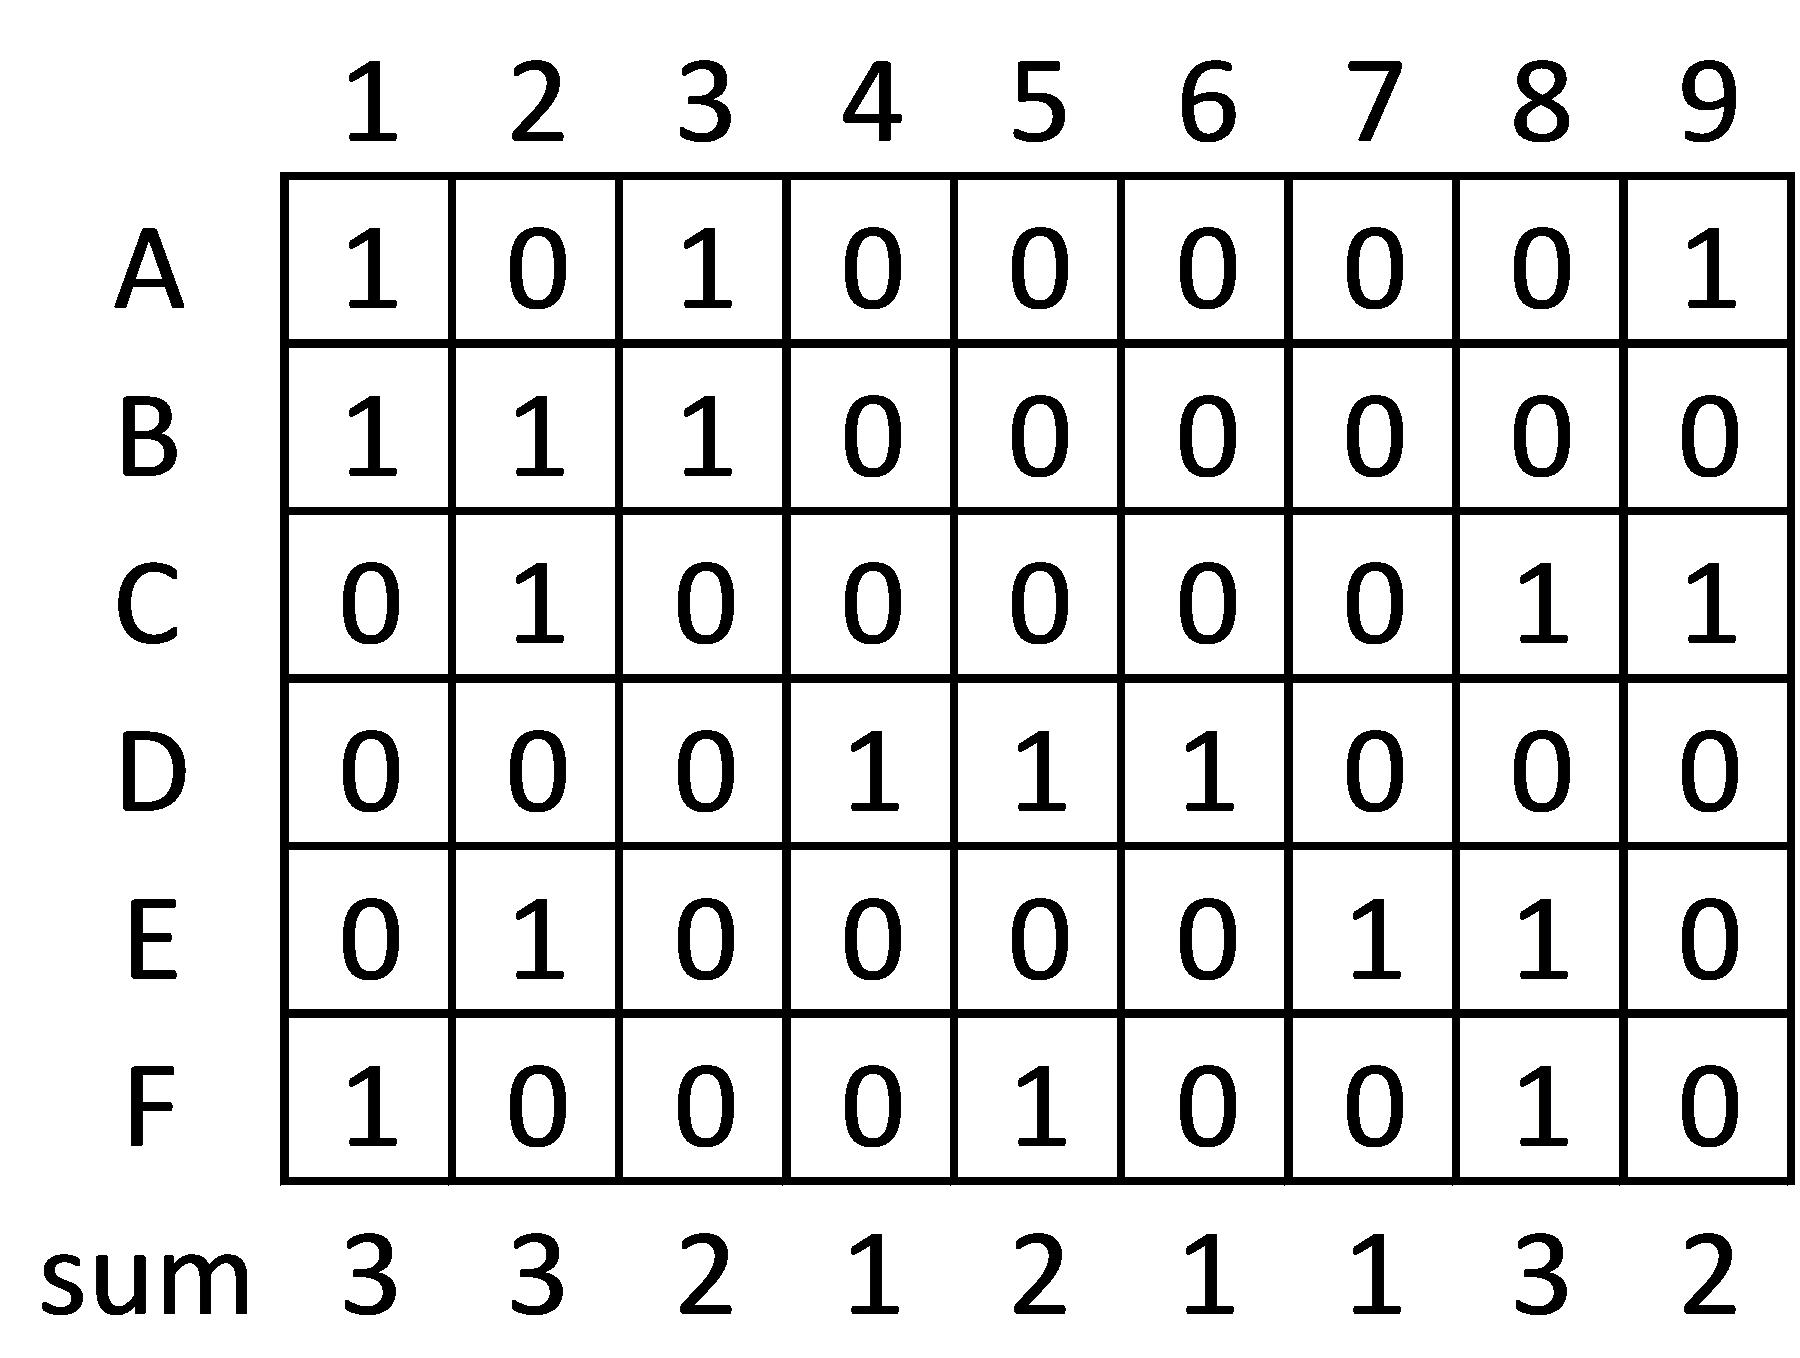 Solving Sudoku with SAS/IML   The SAS Training Post